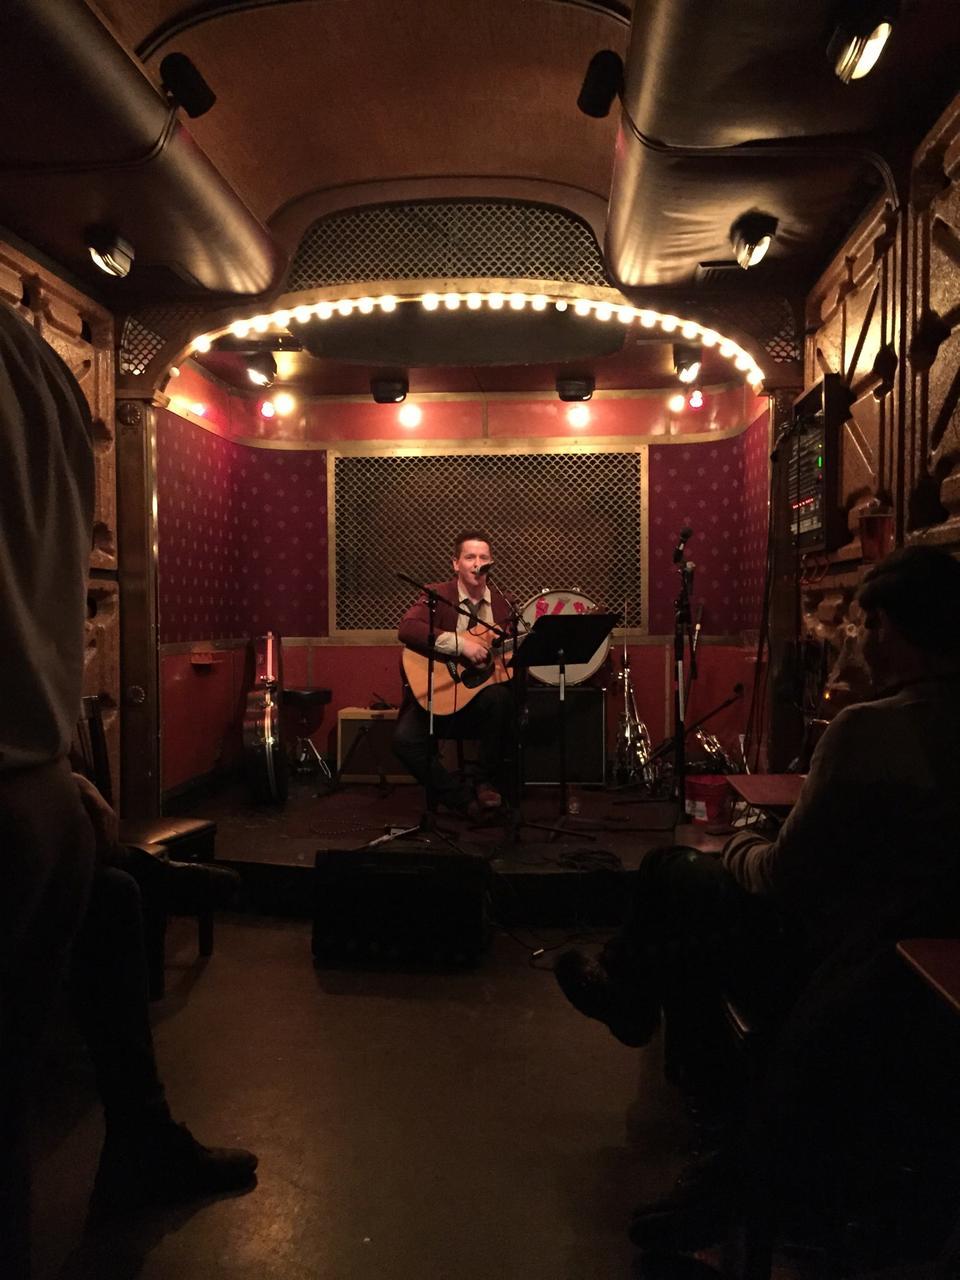 Live Music Bars in New York